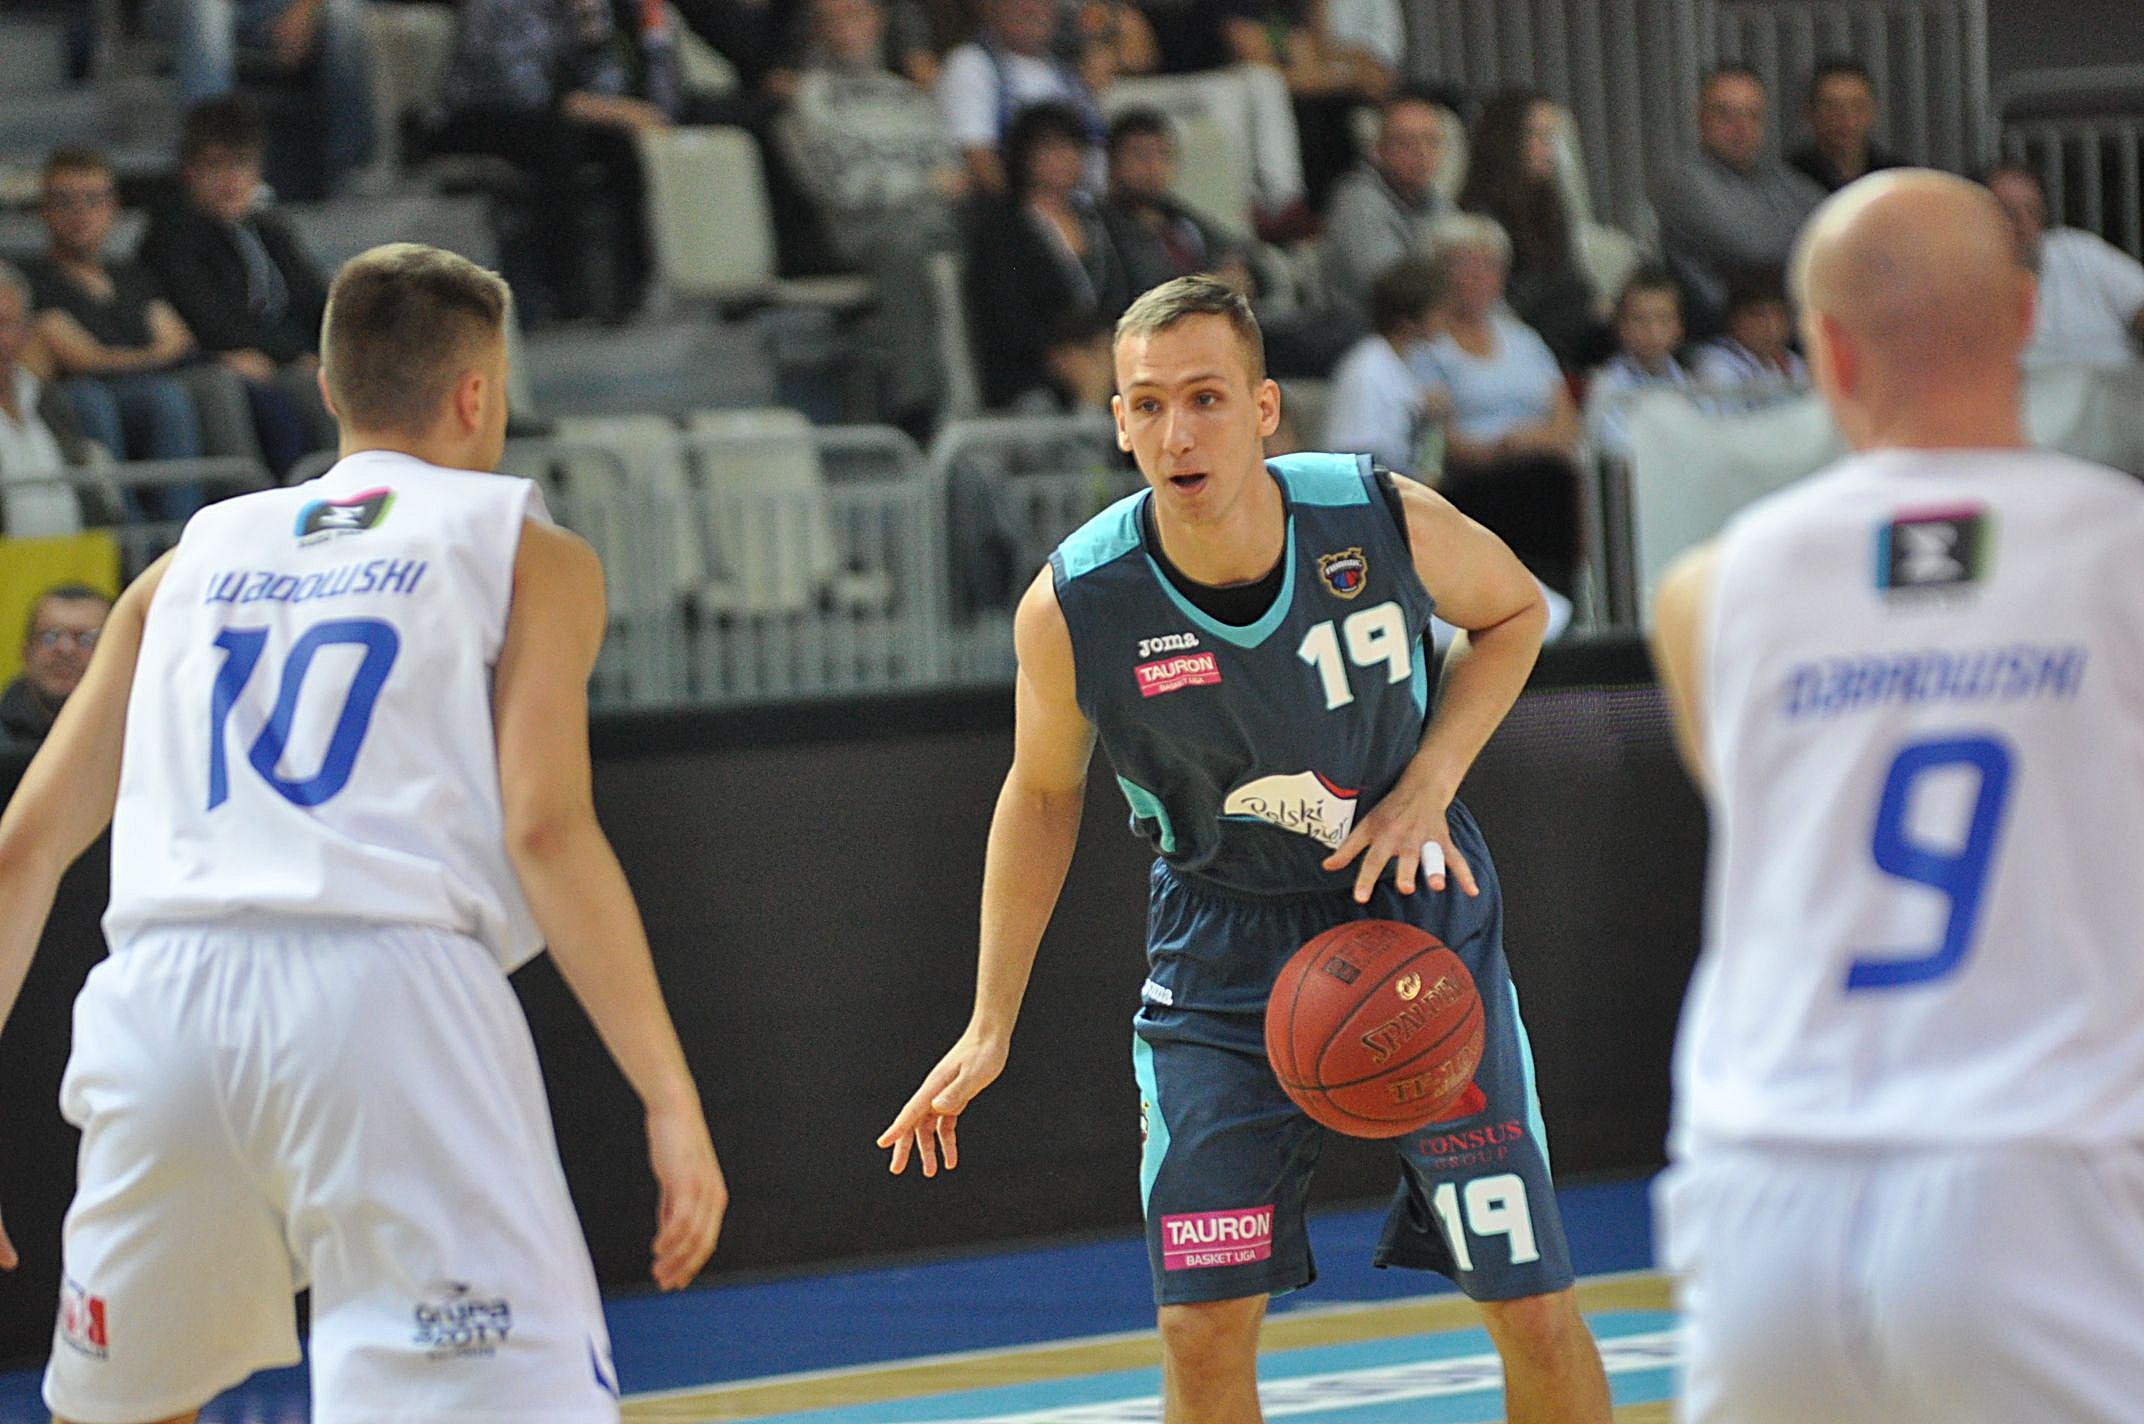 Bartosz Bochno